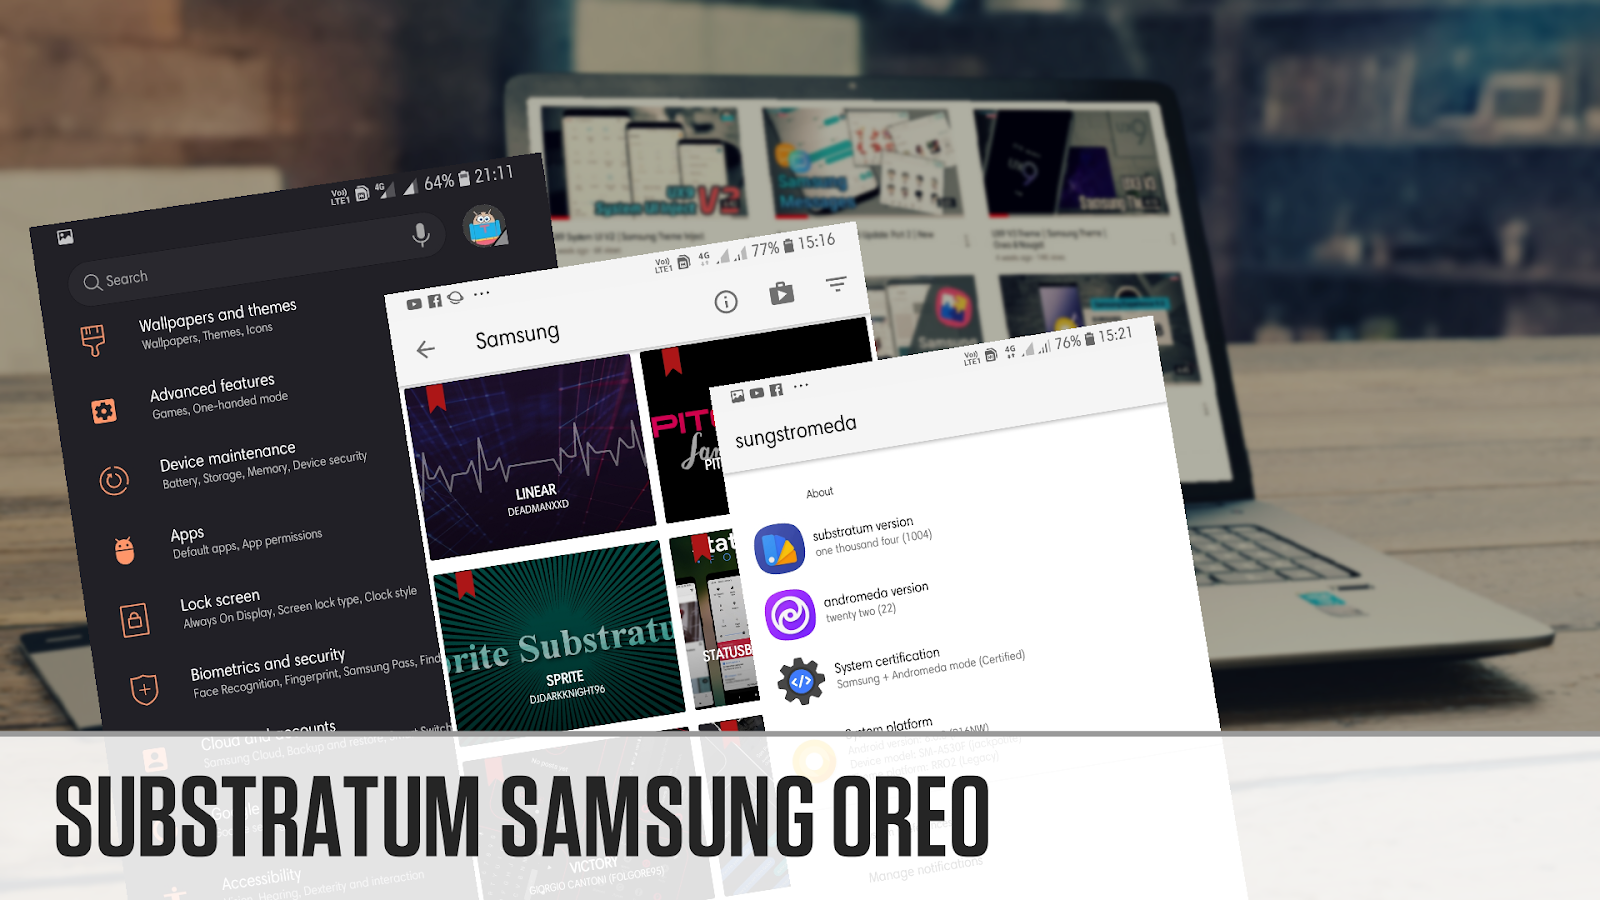 Cara Memasang Substratum Tema Di Samsung Oreo - Thobby Blog